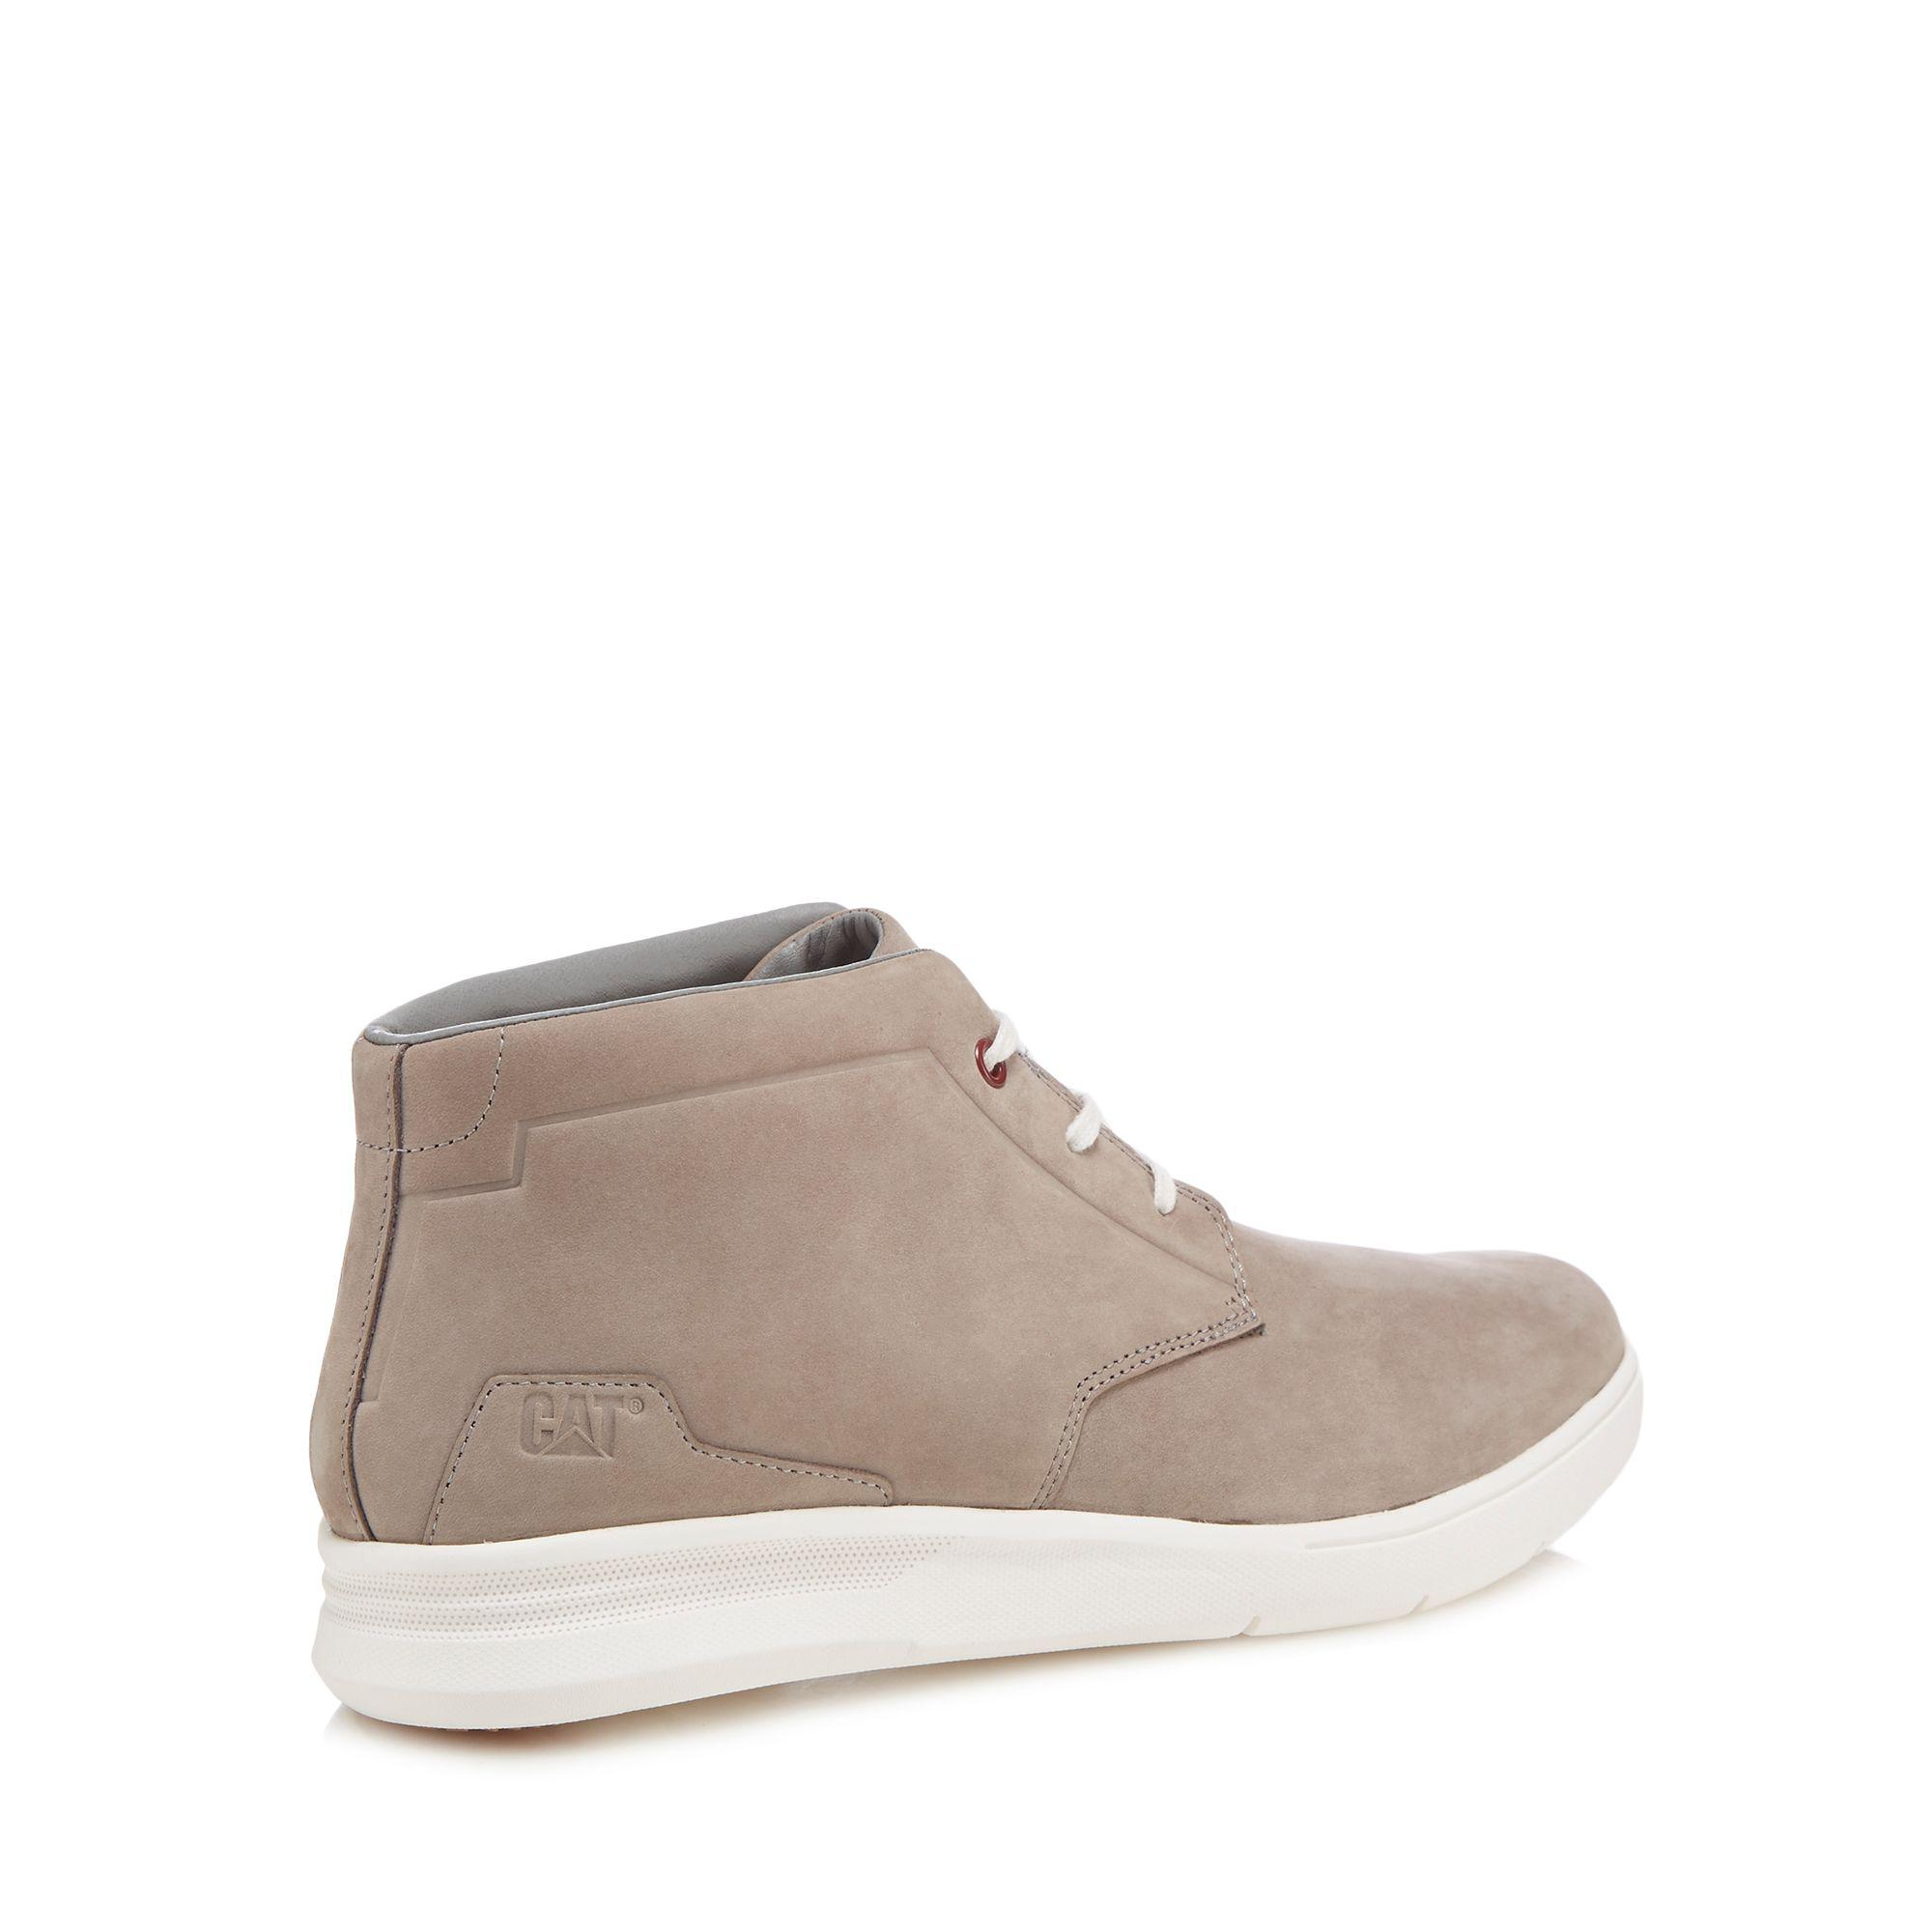 5a5b4fe973c1c Caterpillar Grey Nubuck 'theorem' Chukka Boots in Gray for Men - Lyst